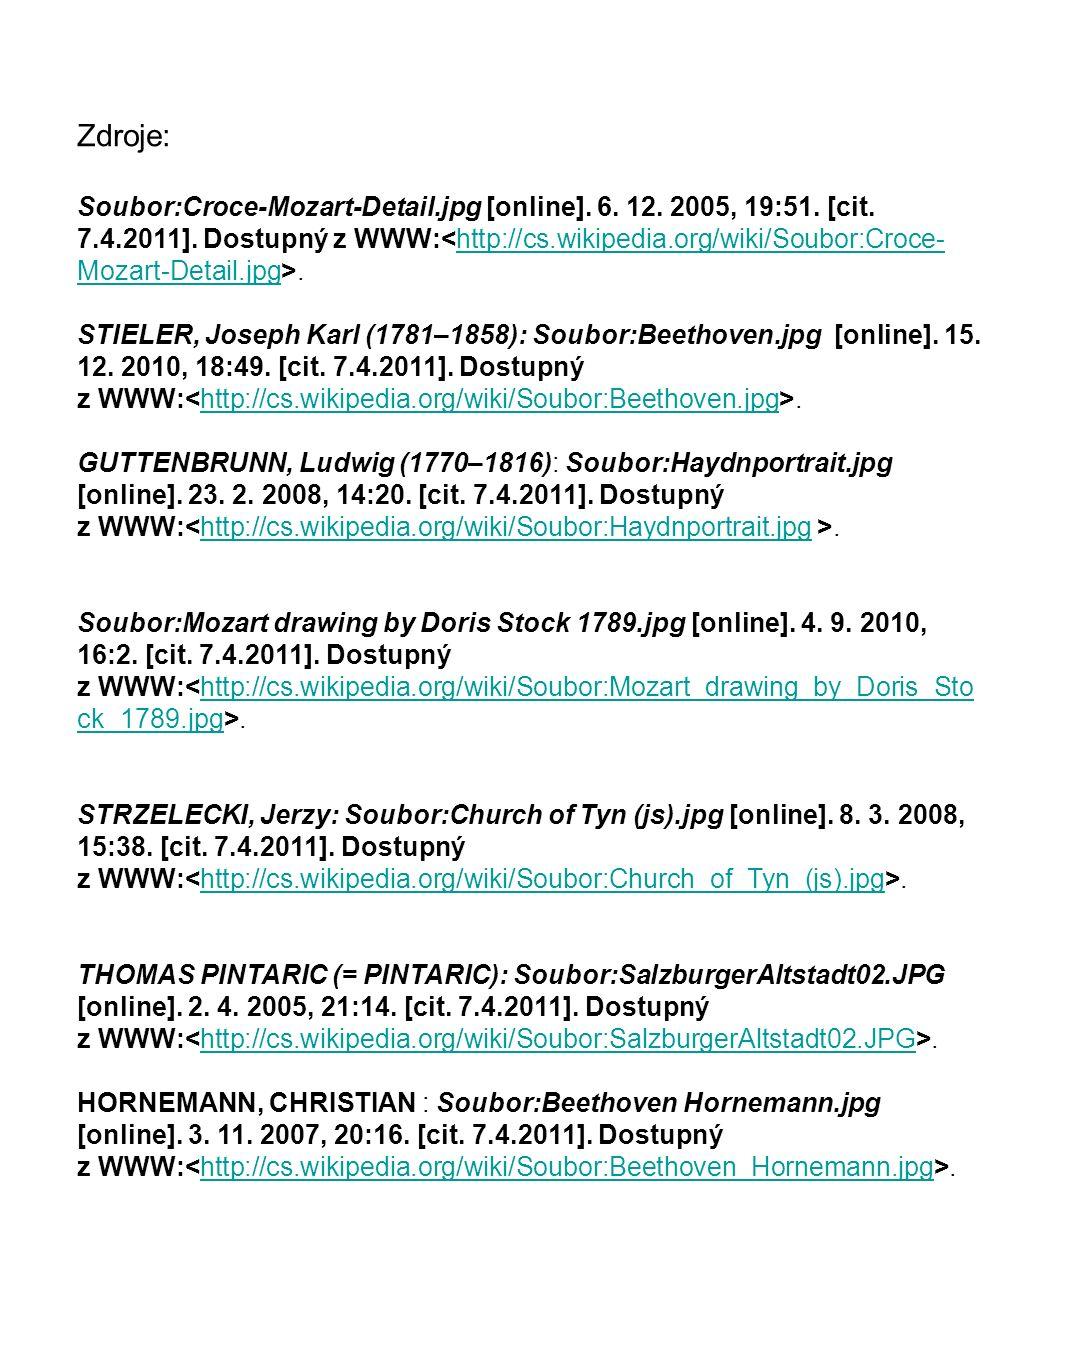 Zdroje: Soubor:Croce-Mozart-Detail.jpg [online]. 6. 12. 2005, 19:51. [cit. 7.4.2011]. Dostupný z WWW:.http://cs.wikipedia.org/wiki/Soubor:Croce- Mozar